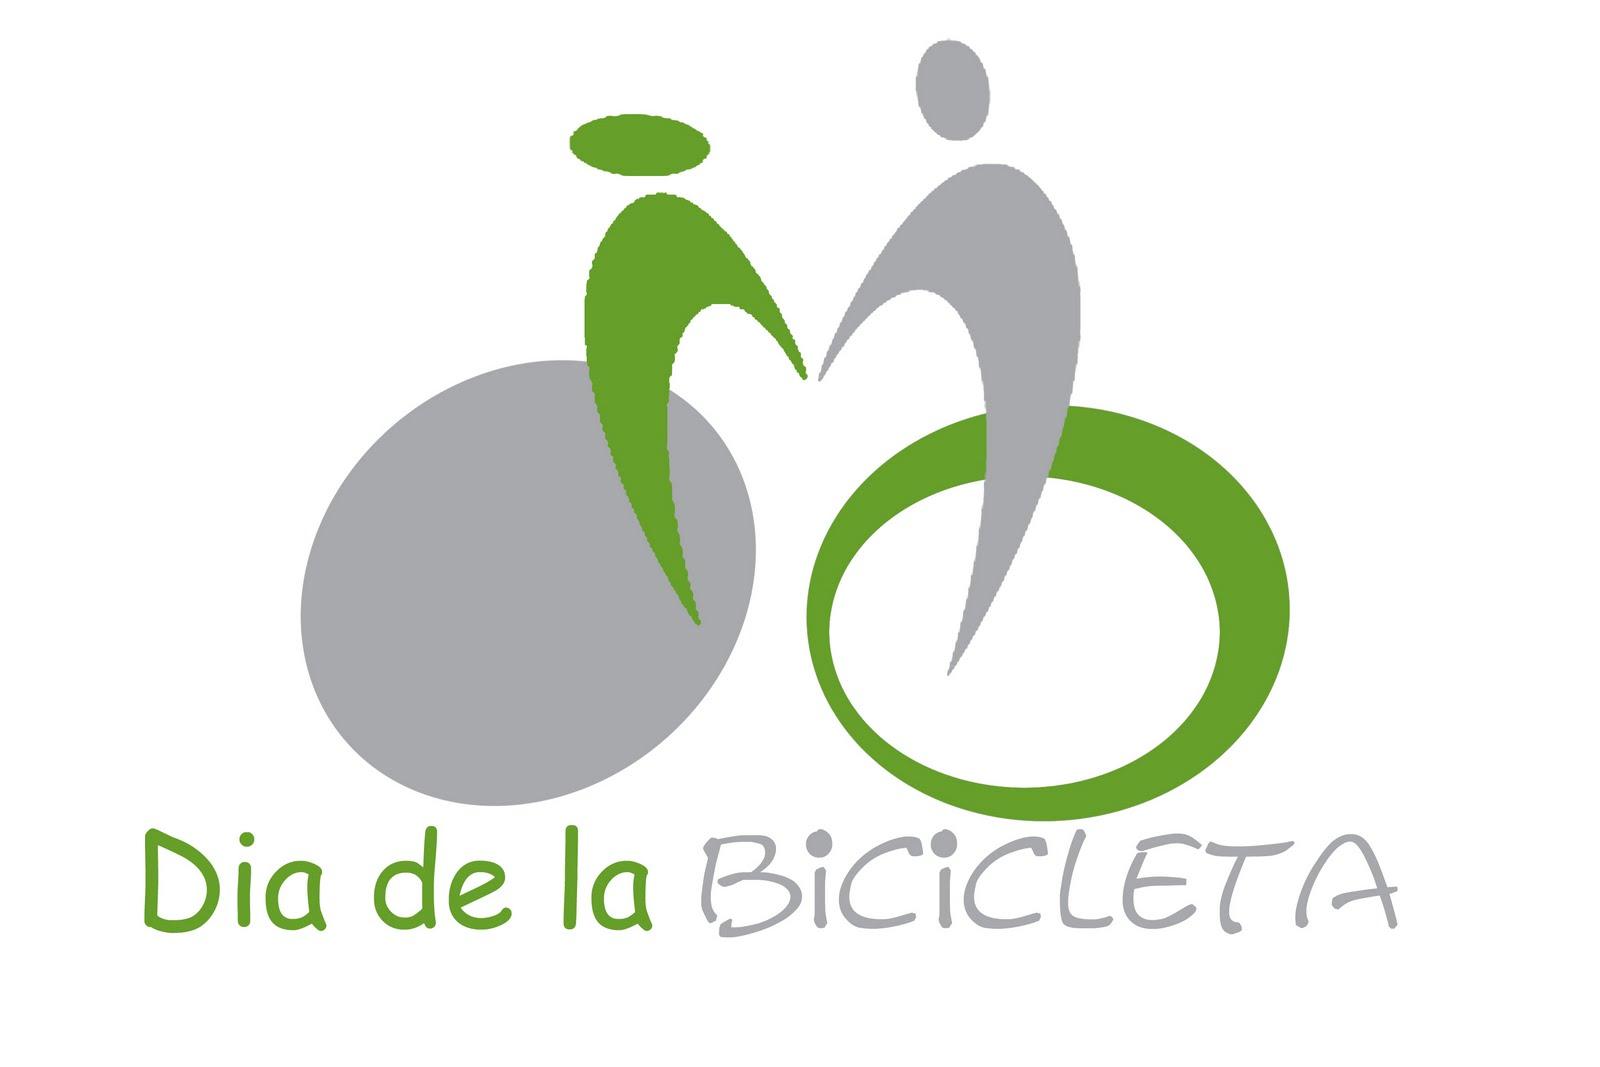 http://3.bp.blogspot.com/_wxGUrAtMiPU/TAN0f_UuHLI/AAAAAAAAIUc/ccViCuvR-eo/s1600/logo+dia+de+la+bici.jpg